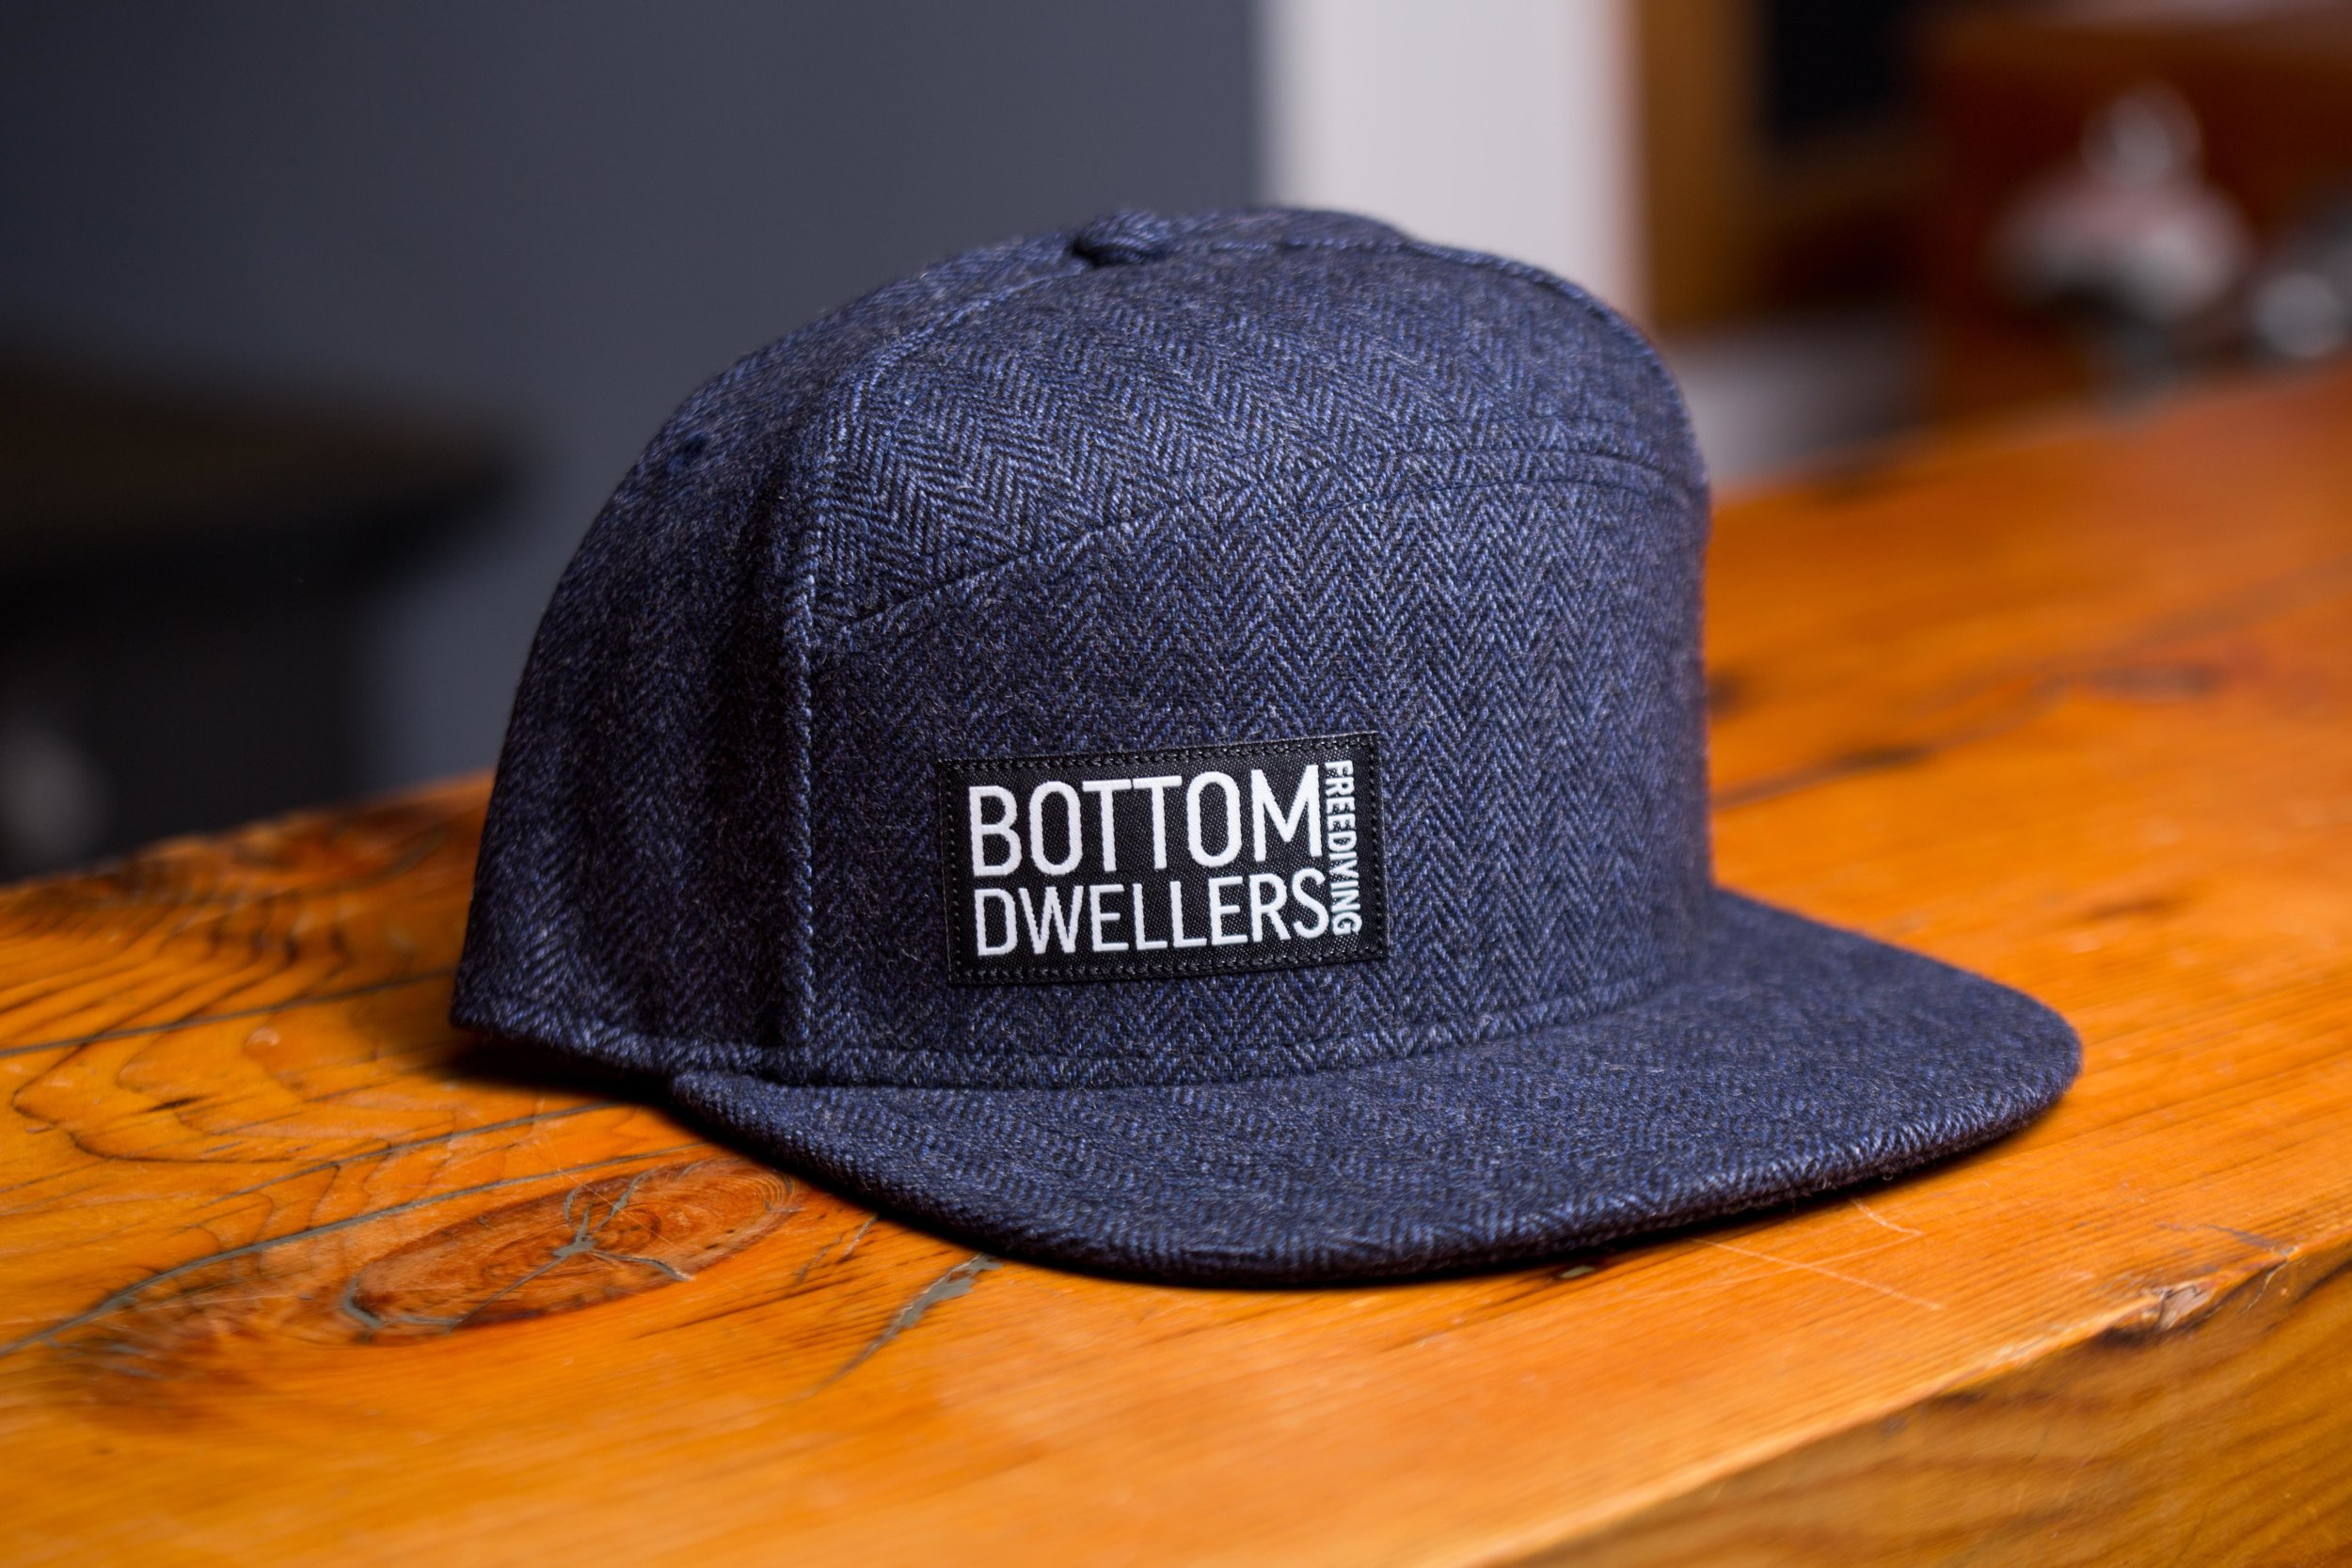 BOTTOM_DWELLERS_WEB_RESOLUTION-85.jpeg